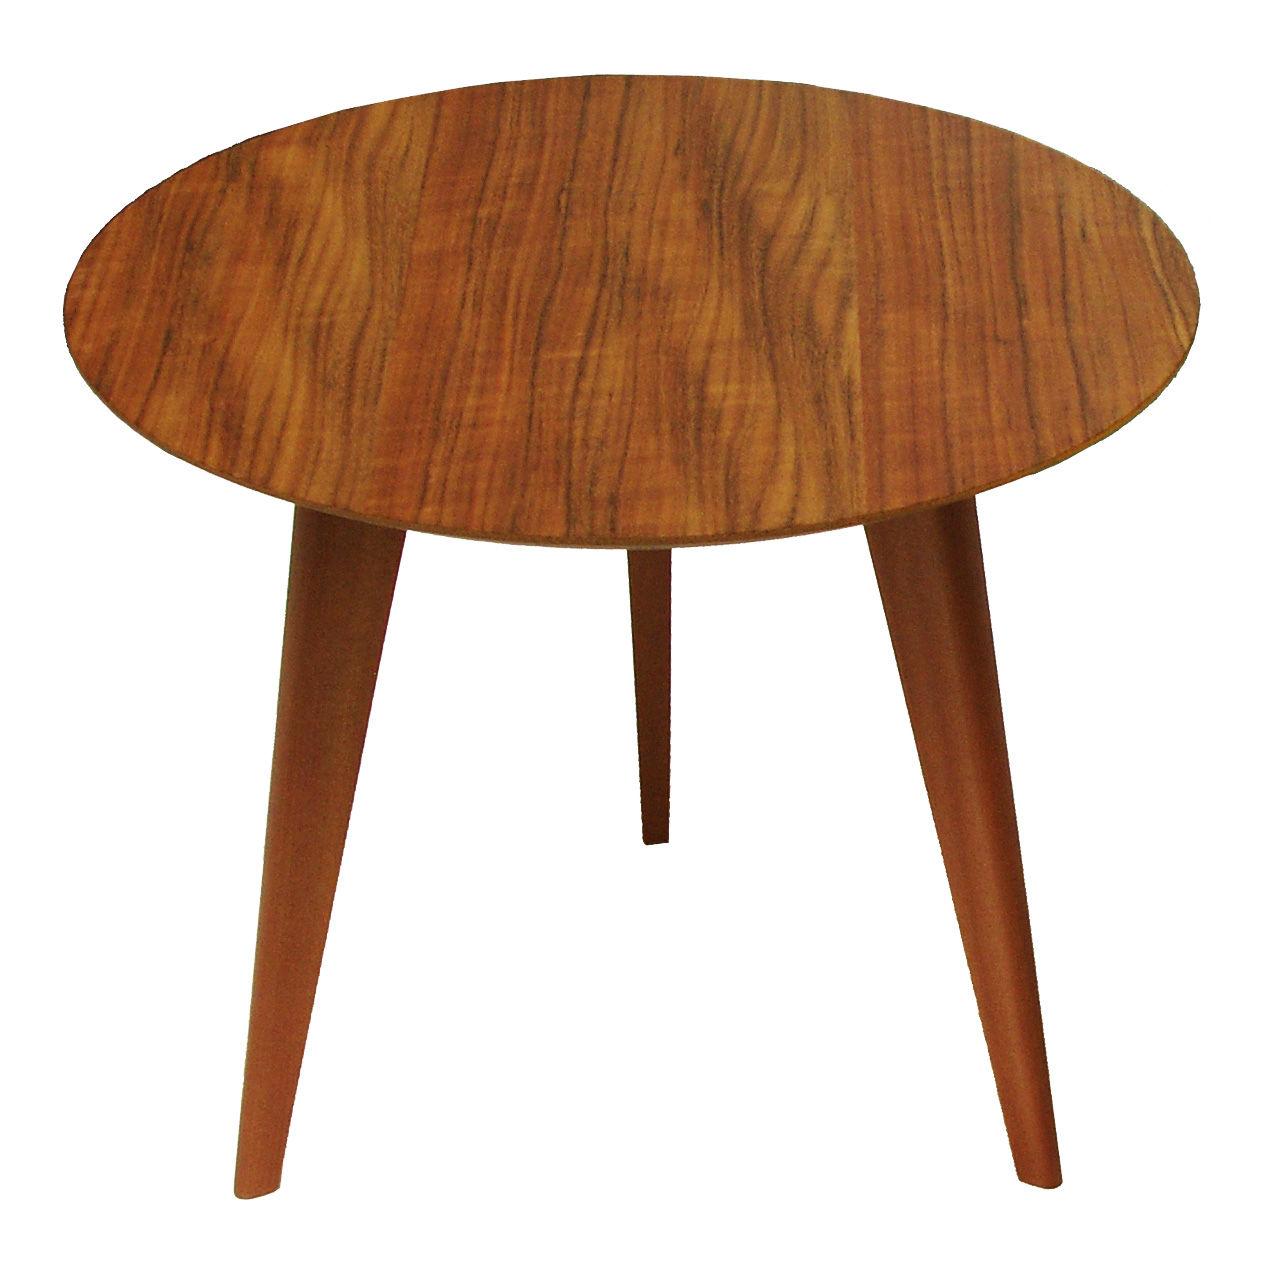 Mobilier - Tables basses - Table basse Lalinde Ronde / Small - Ø 45 cm - Sentou Edition - Teck / Pieds chêne - Chêne massif, MDF plaqué teck